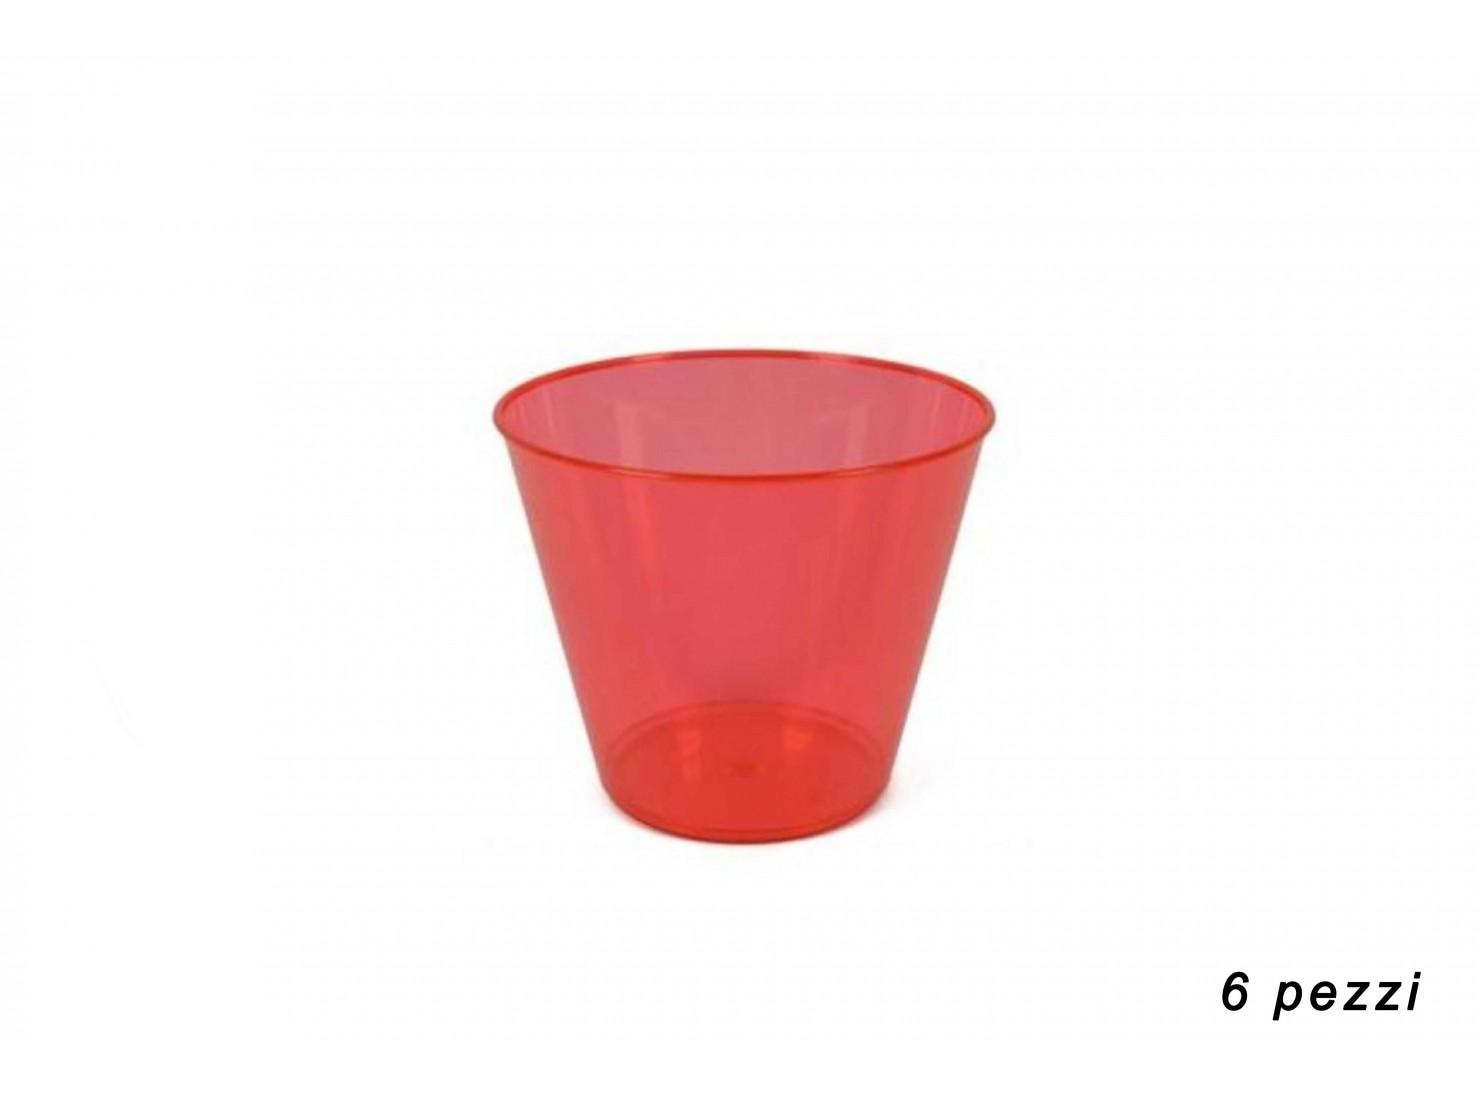 COPPA GELATO PLAST. ROSSO 6 PZ